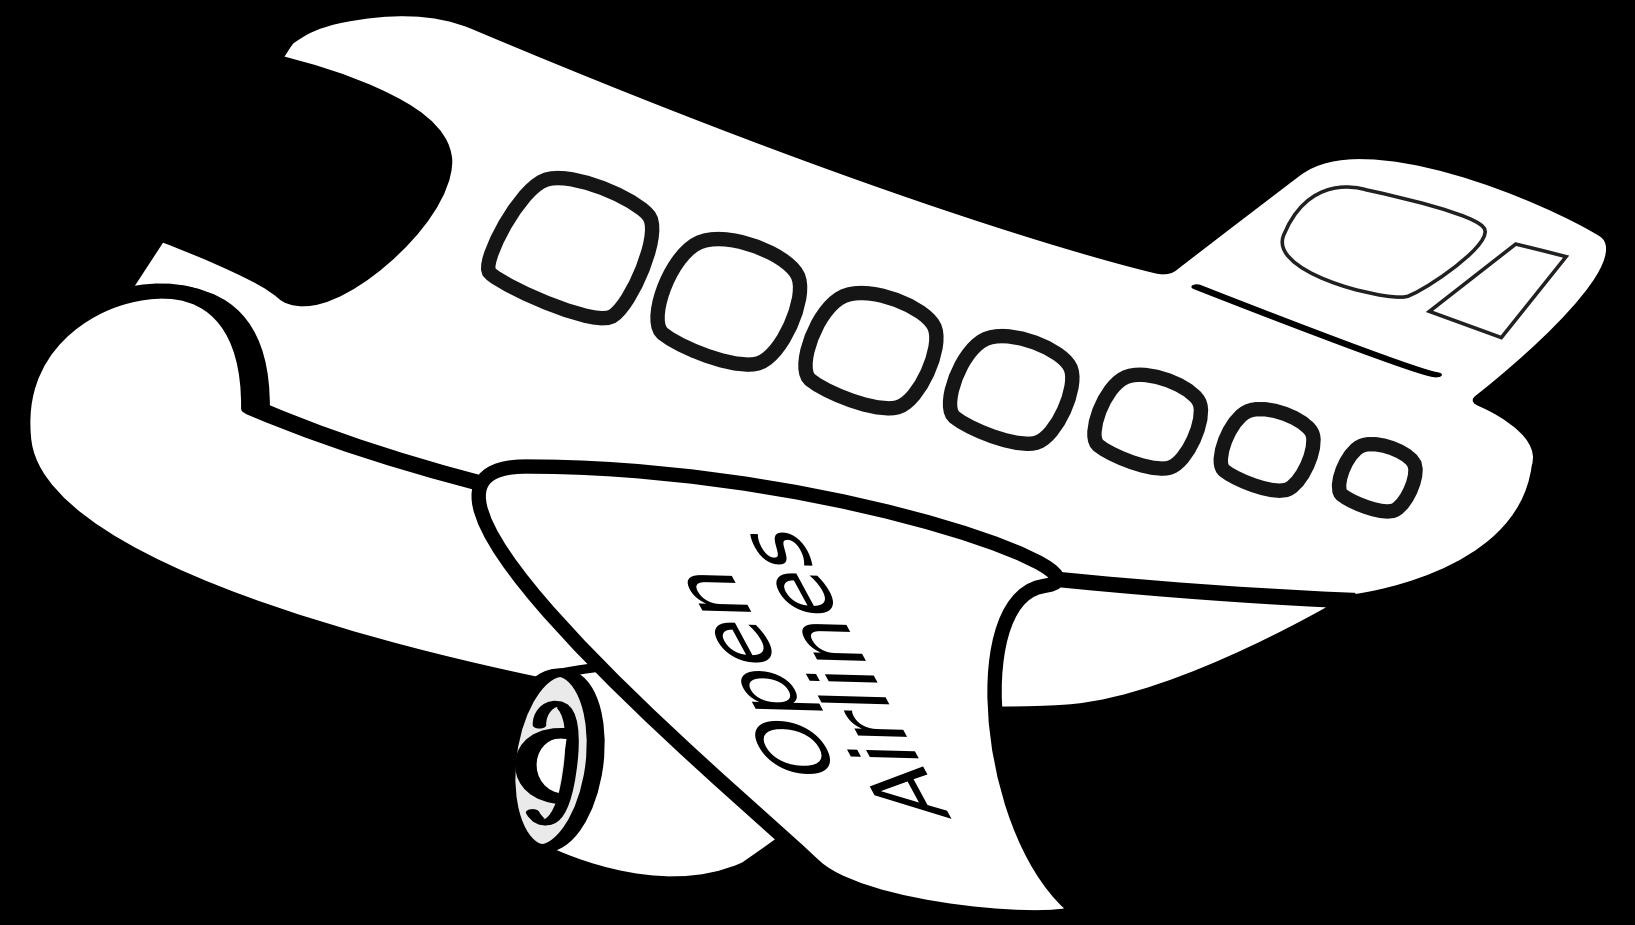 Black and white clipart aereo free stock Aereo Passeggeri Funny Airplane Black White Line Art - Clip Art ... free stock